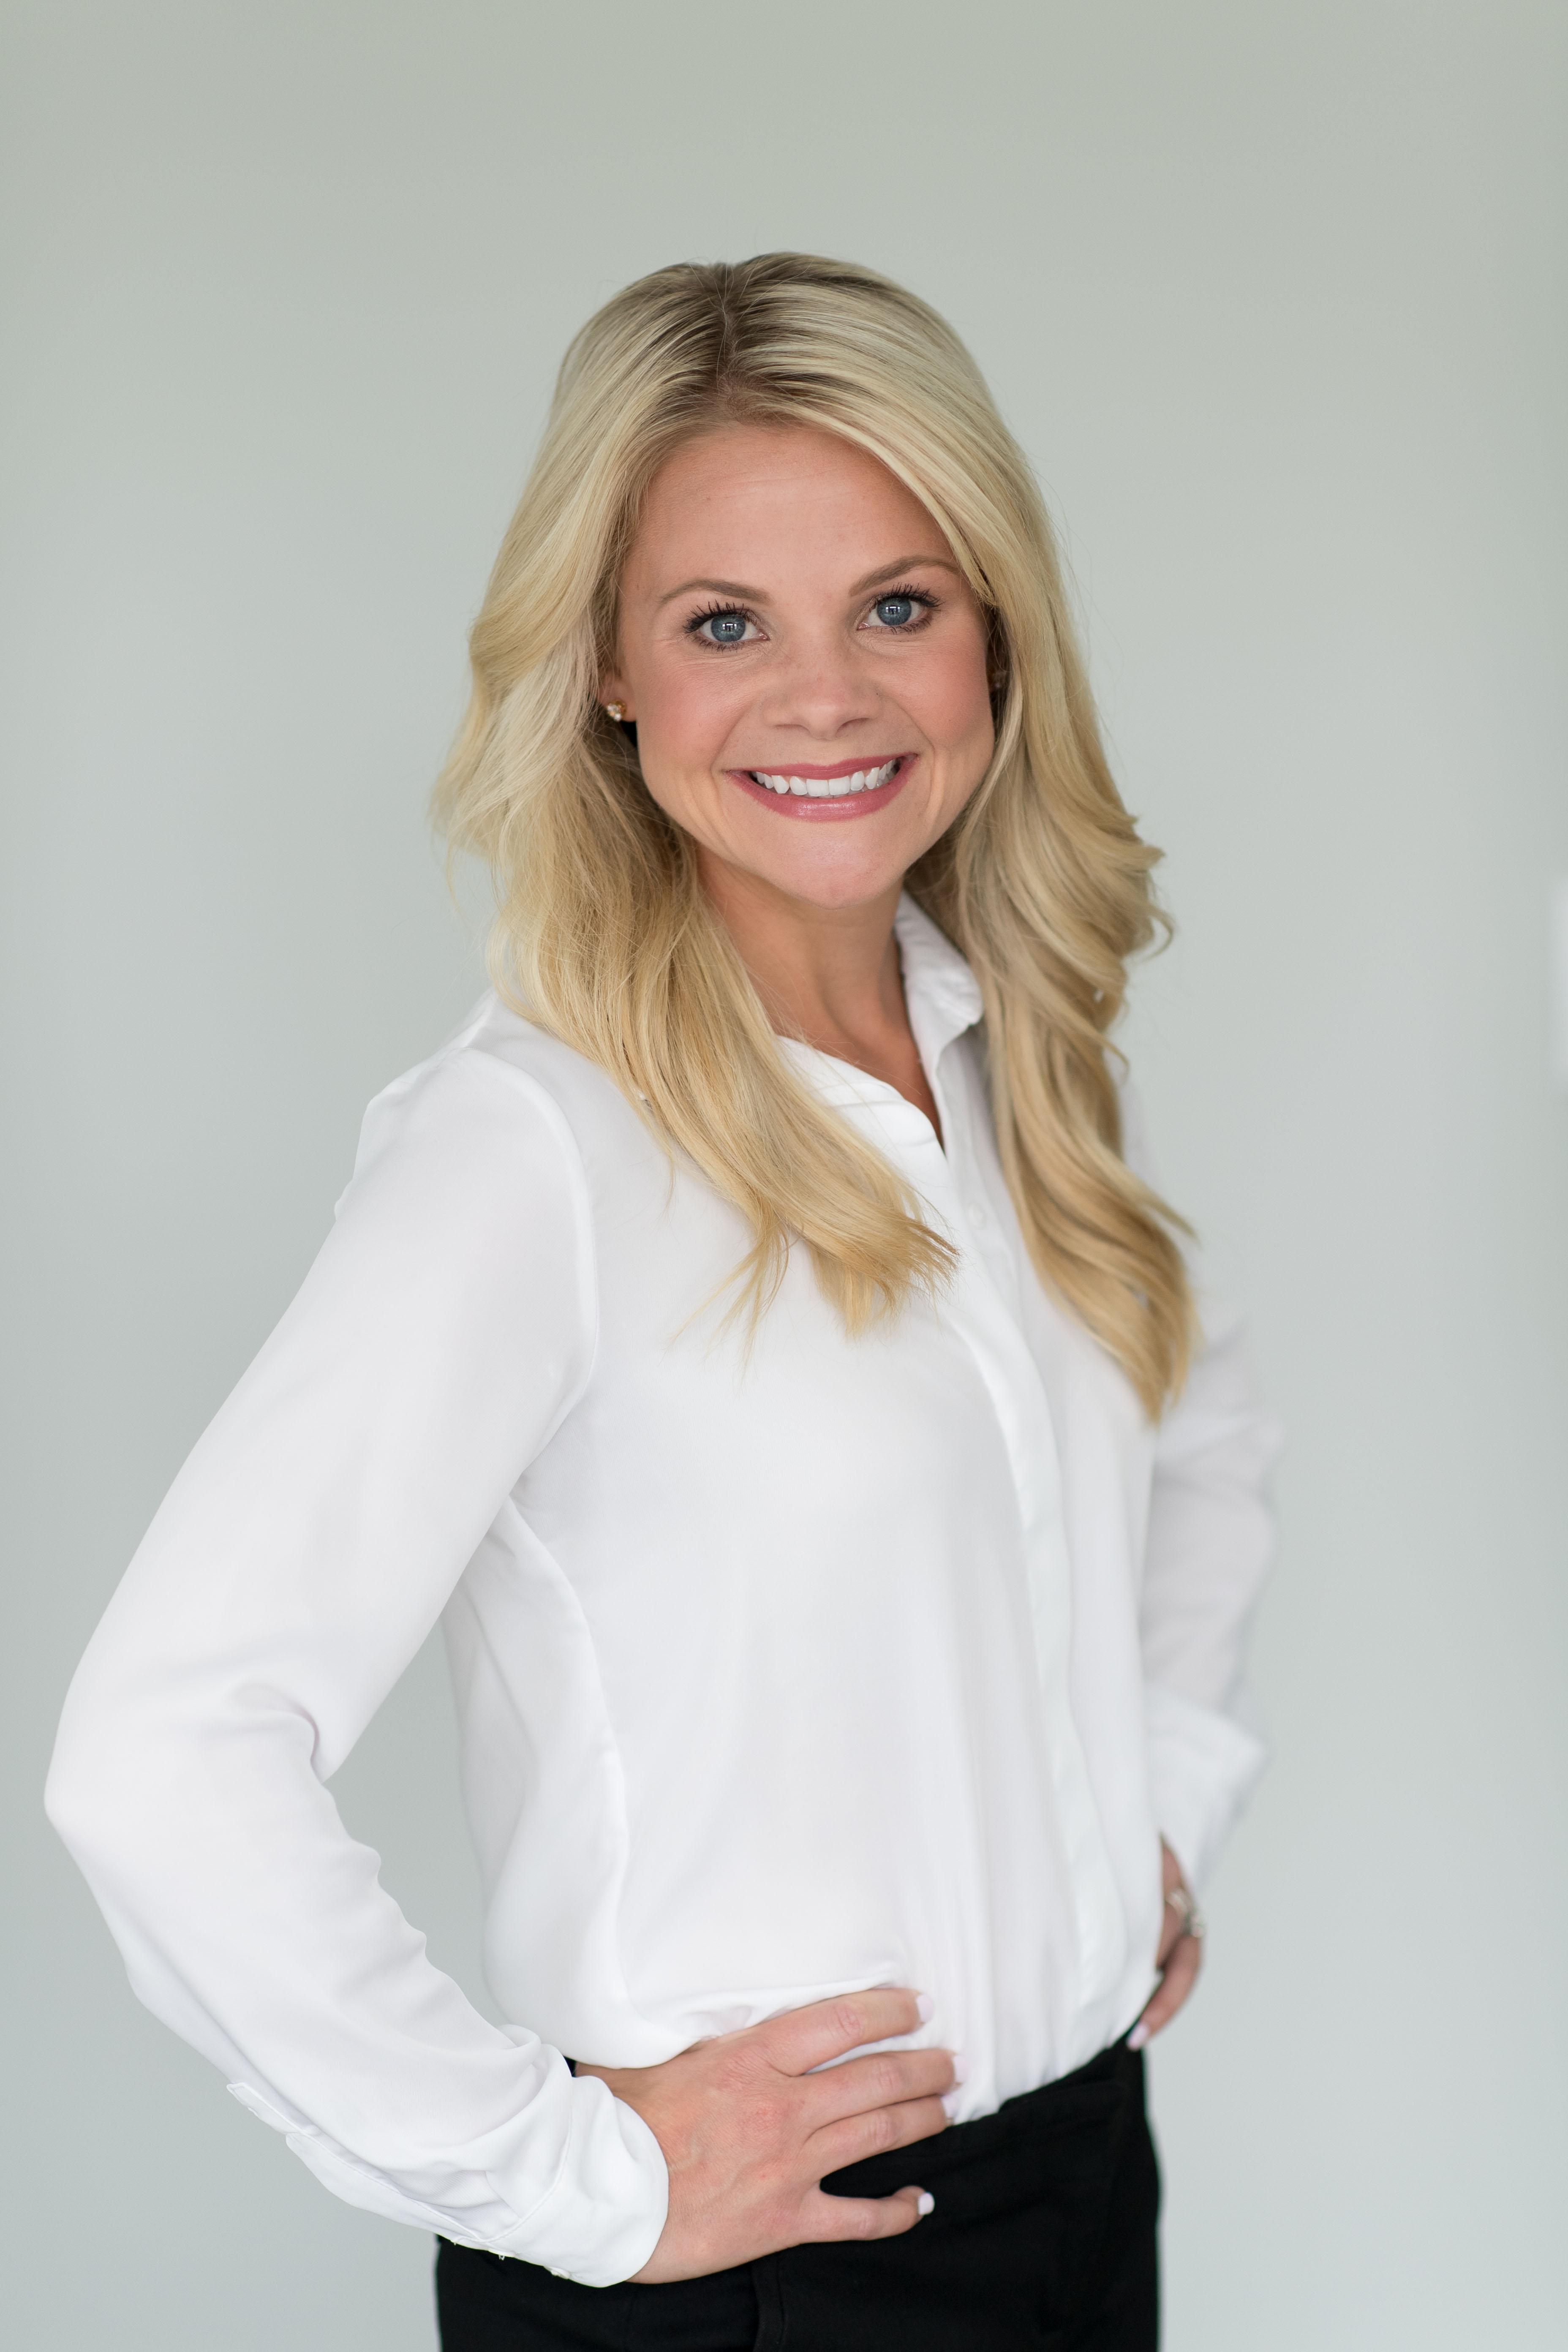 Ashley Leavitt